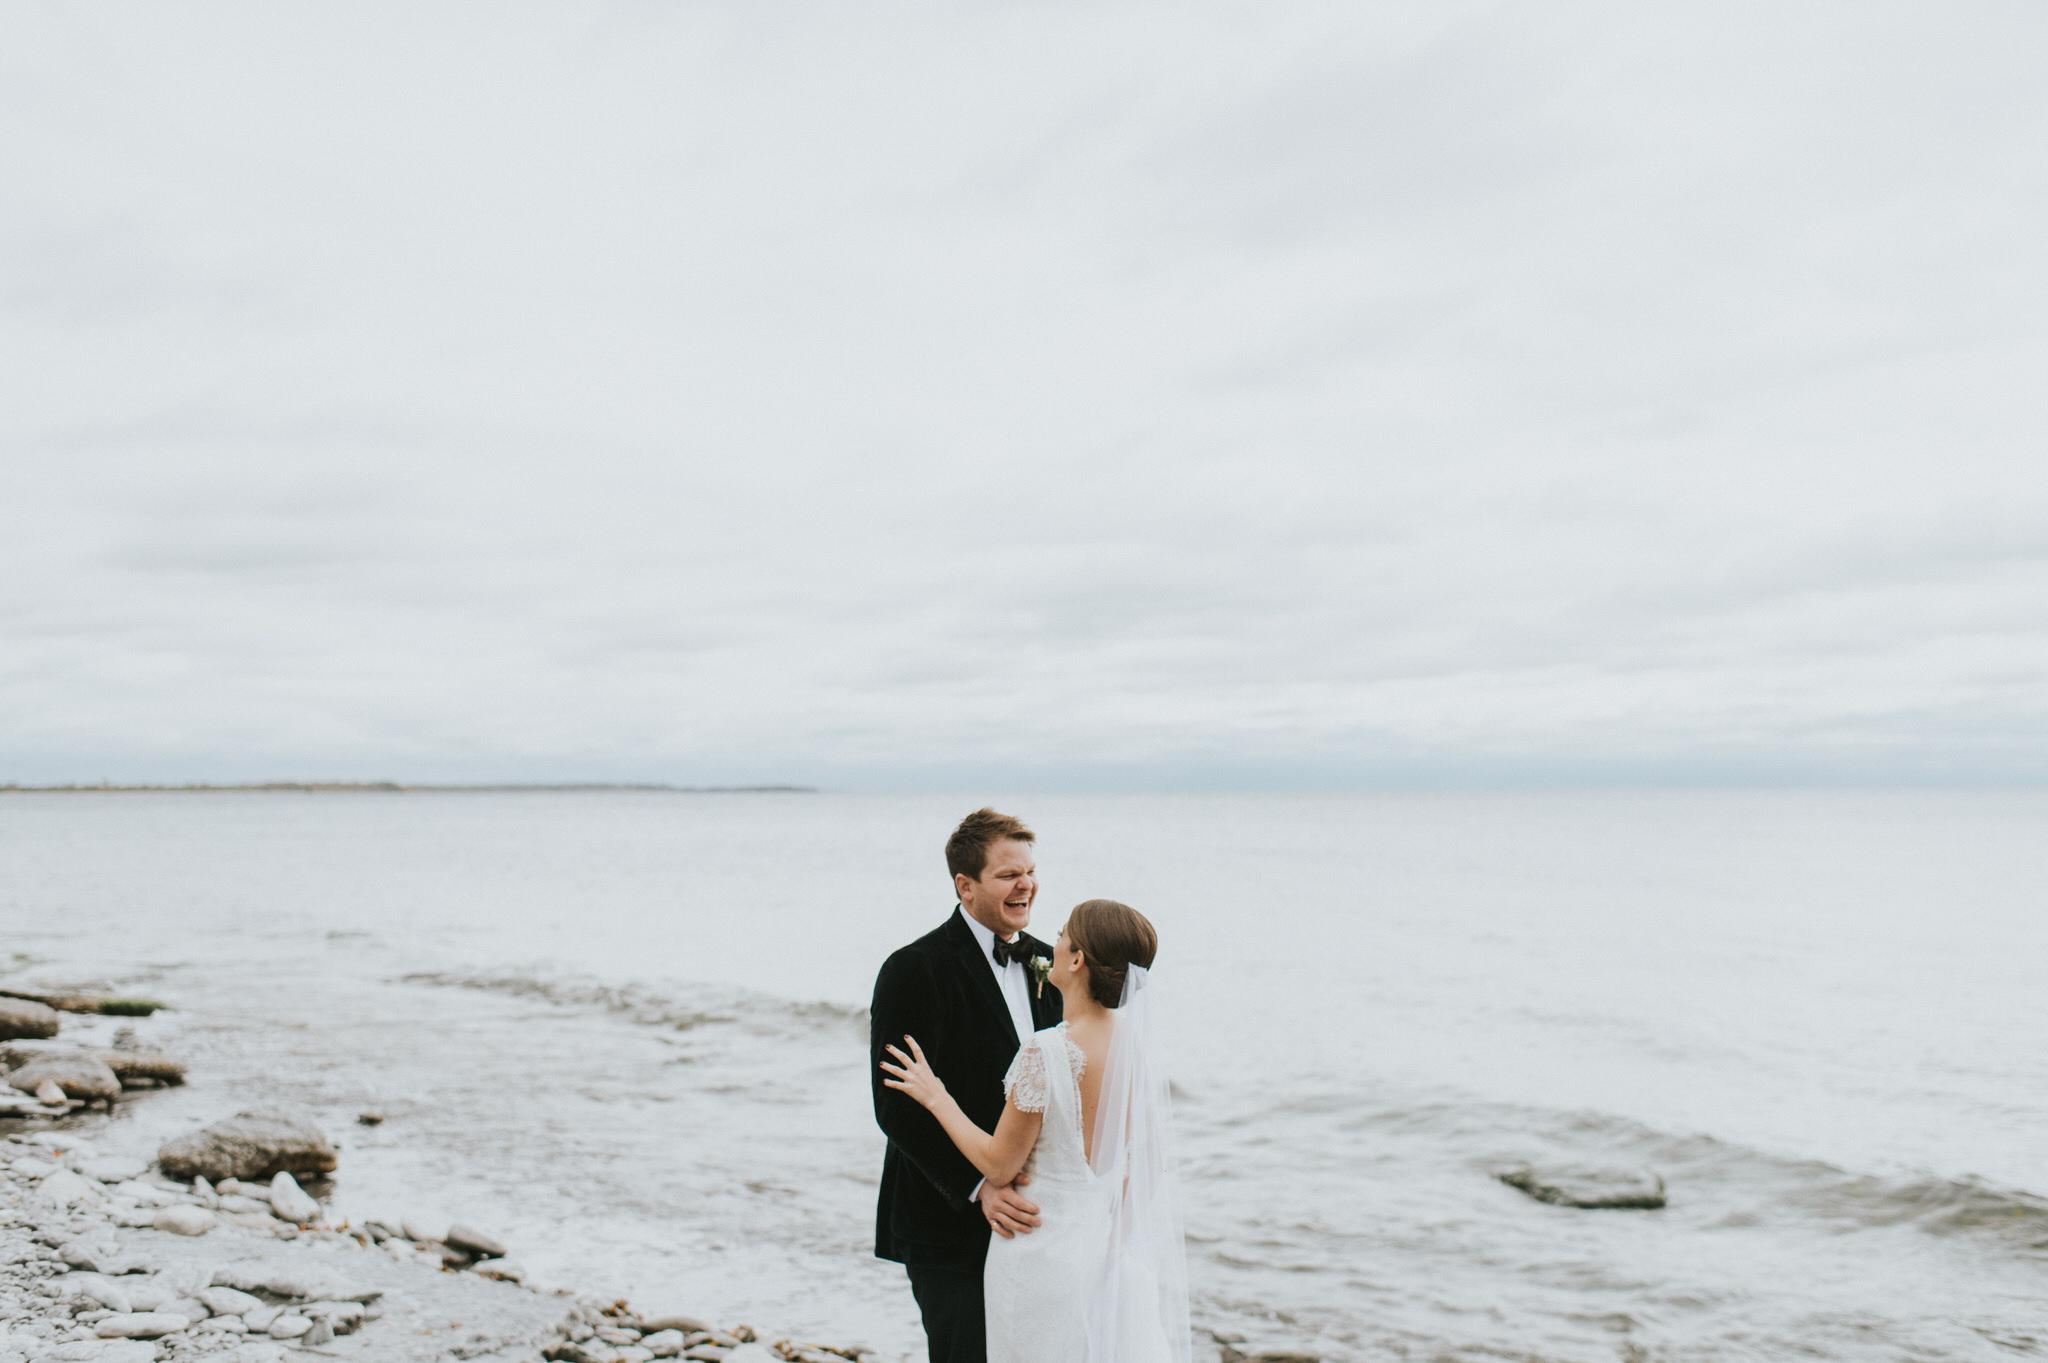 scarletoneillphotography_weddingphotography_prince edward county weddings043.JPG